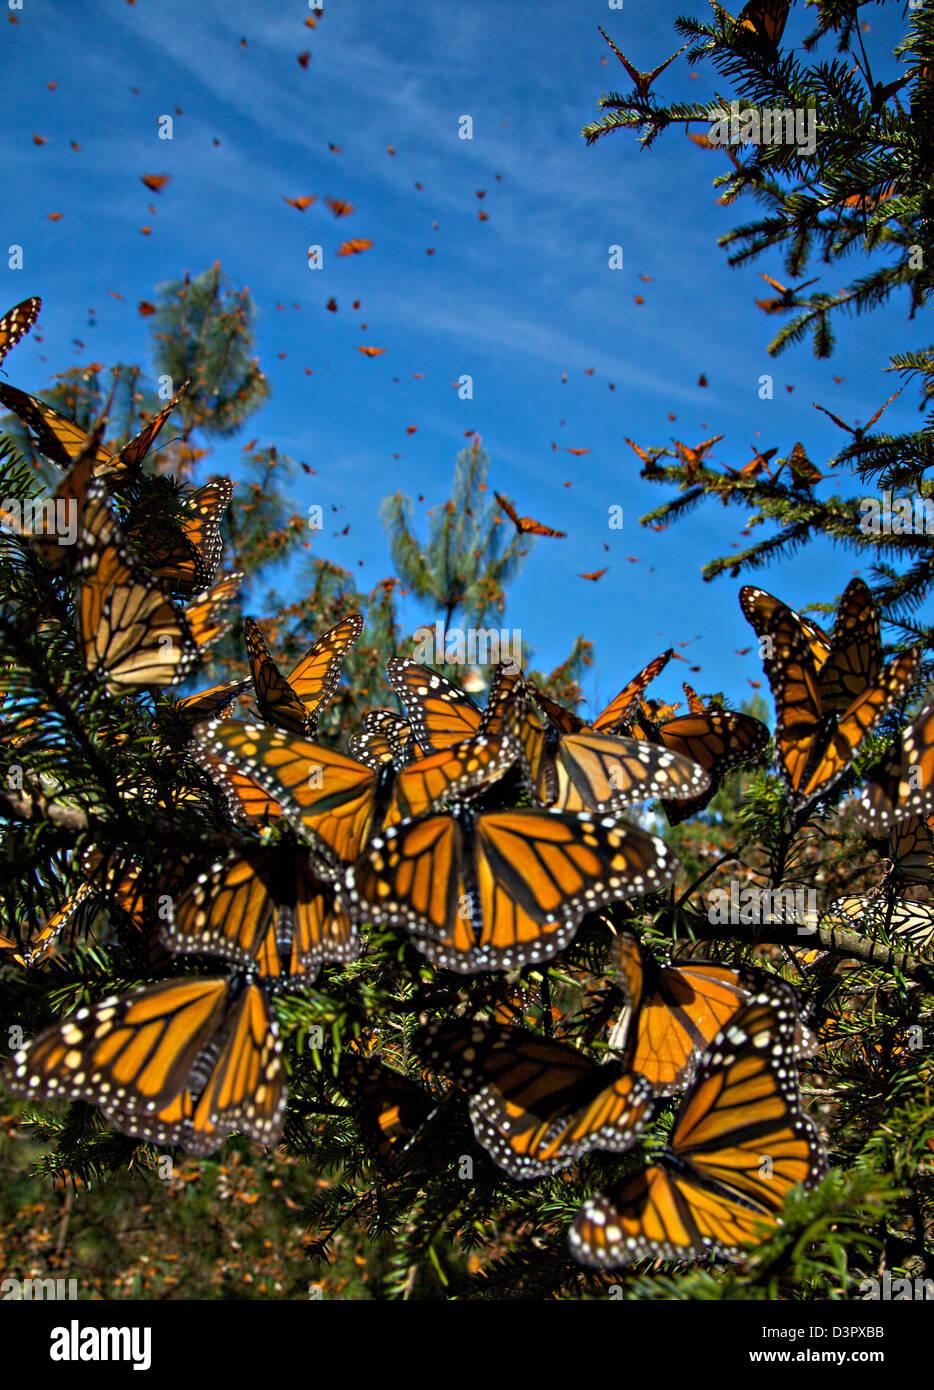 Monarchfalter Masse in den Bergen der Sierra Pellon auf den Monarchfalter Biosphärenreservat in Sierra Pellon Stockbild